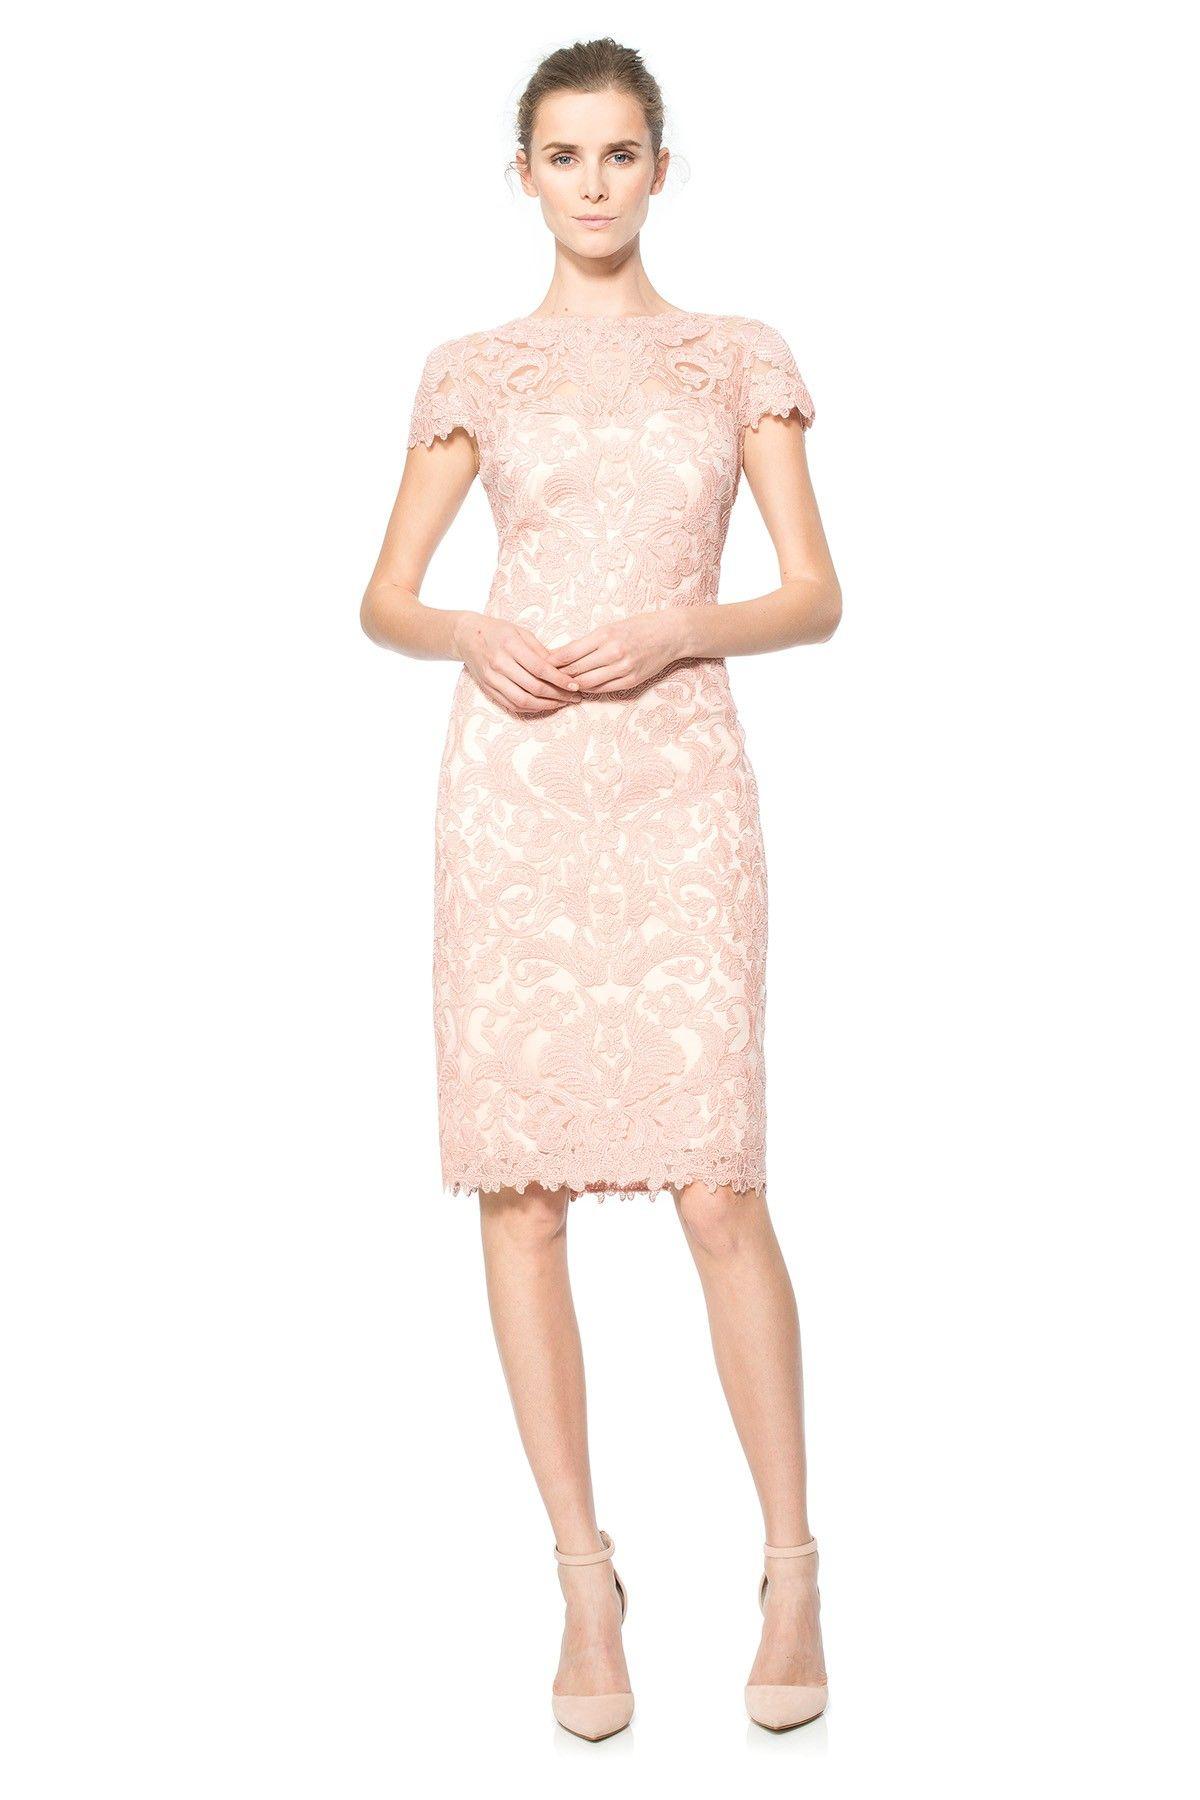 Tadashi Shoji Corded Embroidery On Tulle Cap Sleeve Dress